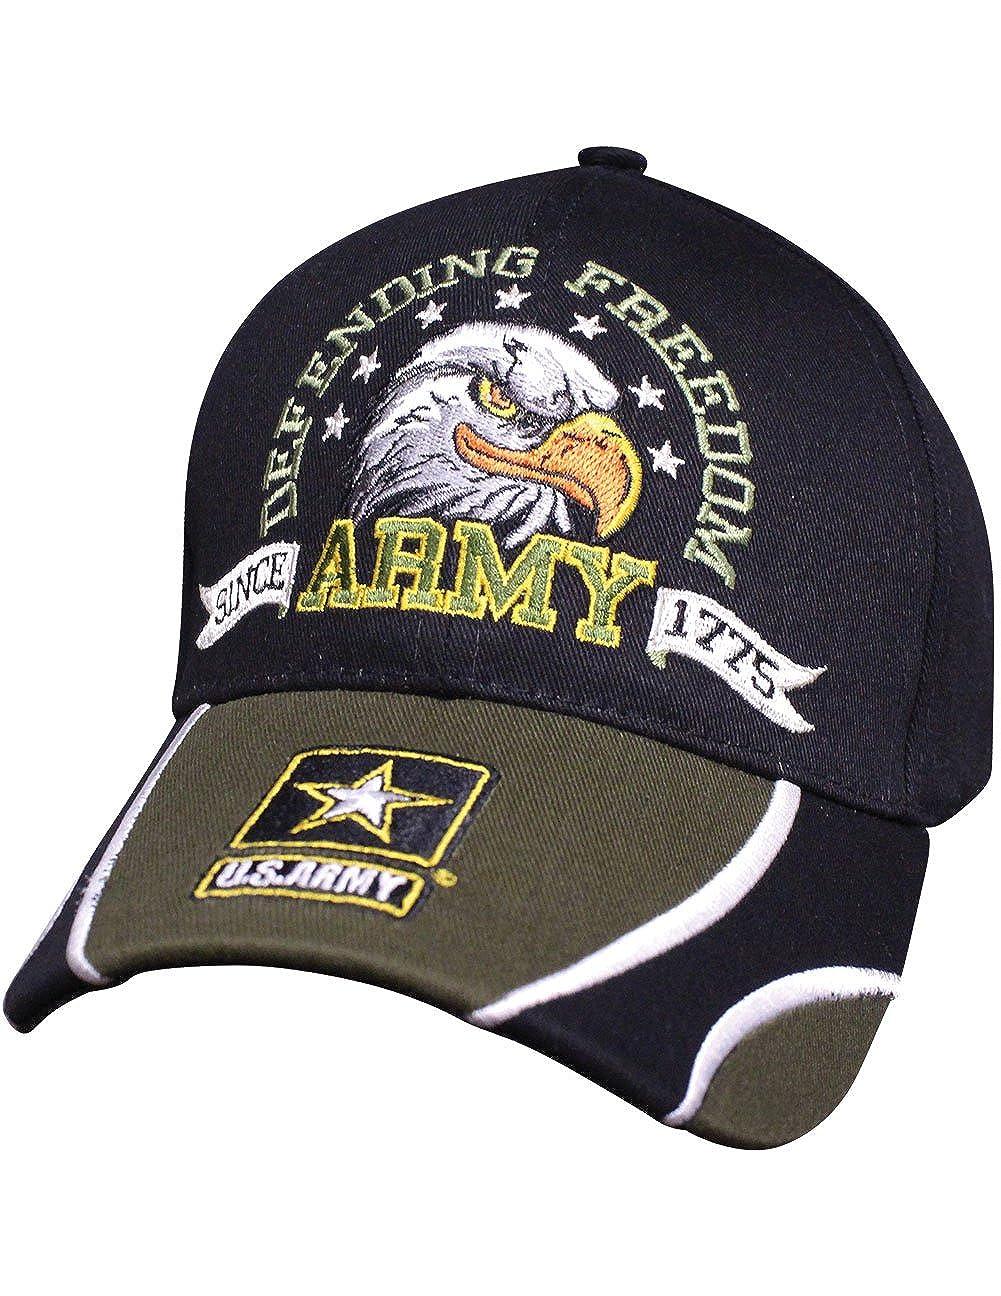 Capsmith inc military branch emblem embroidered cotton adult baseball cap  us army clothing jpg 1001x1296 Capsmith e3438599c6f8